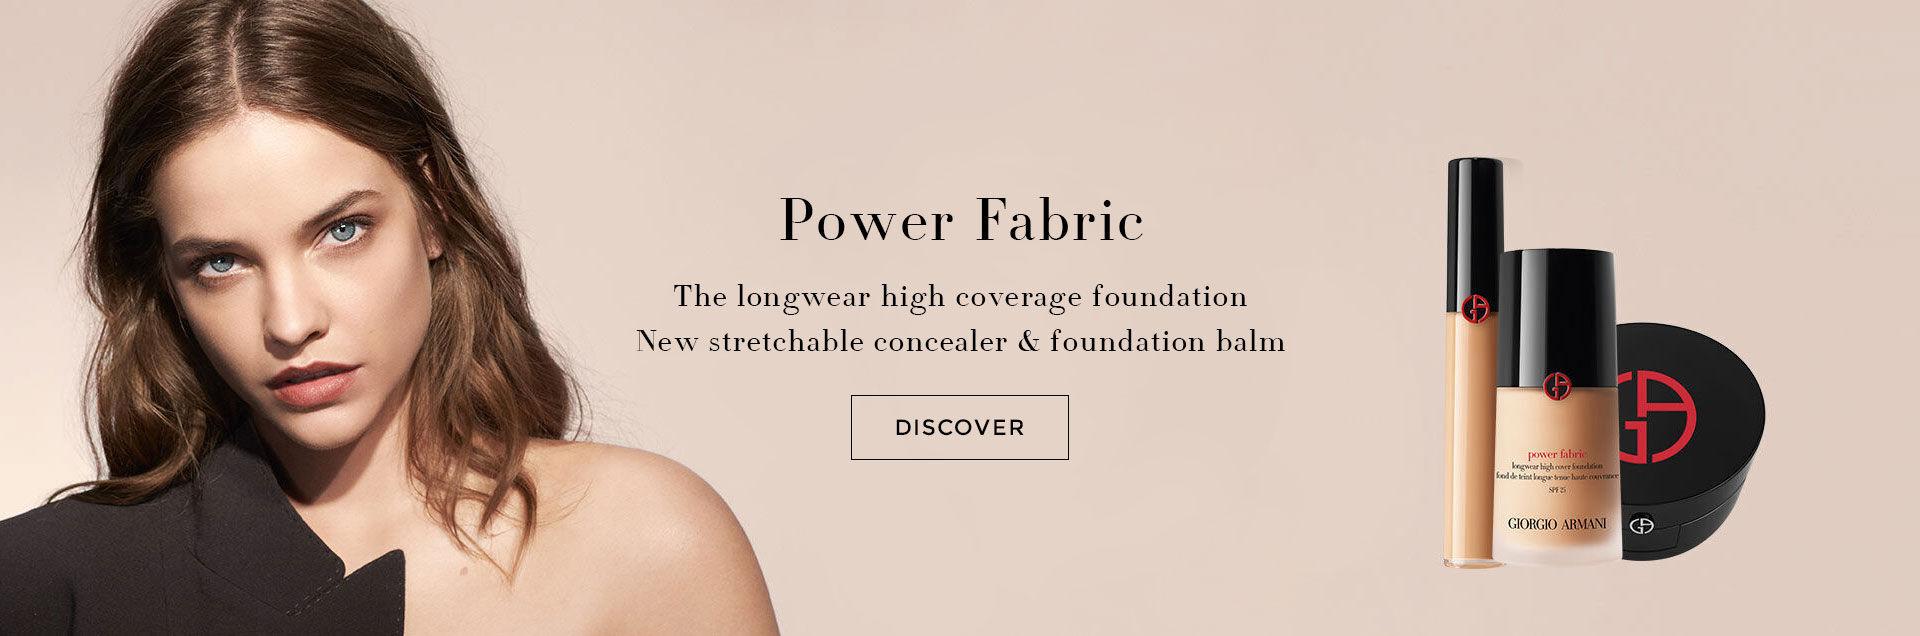 Power Fabric